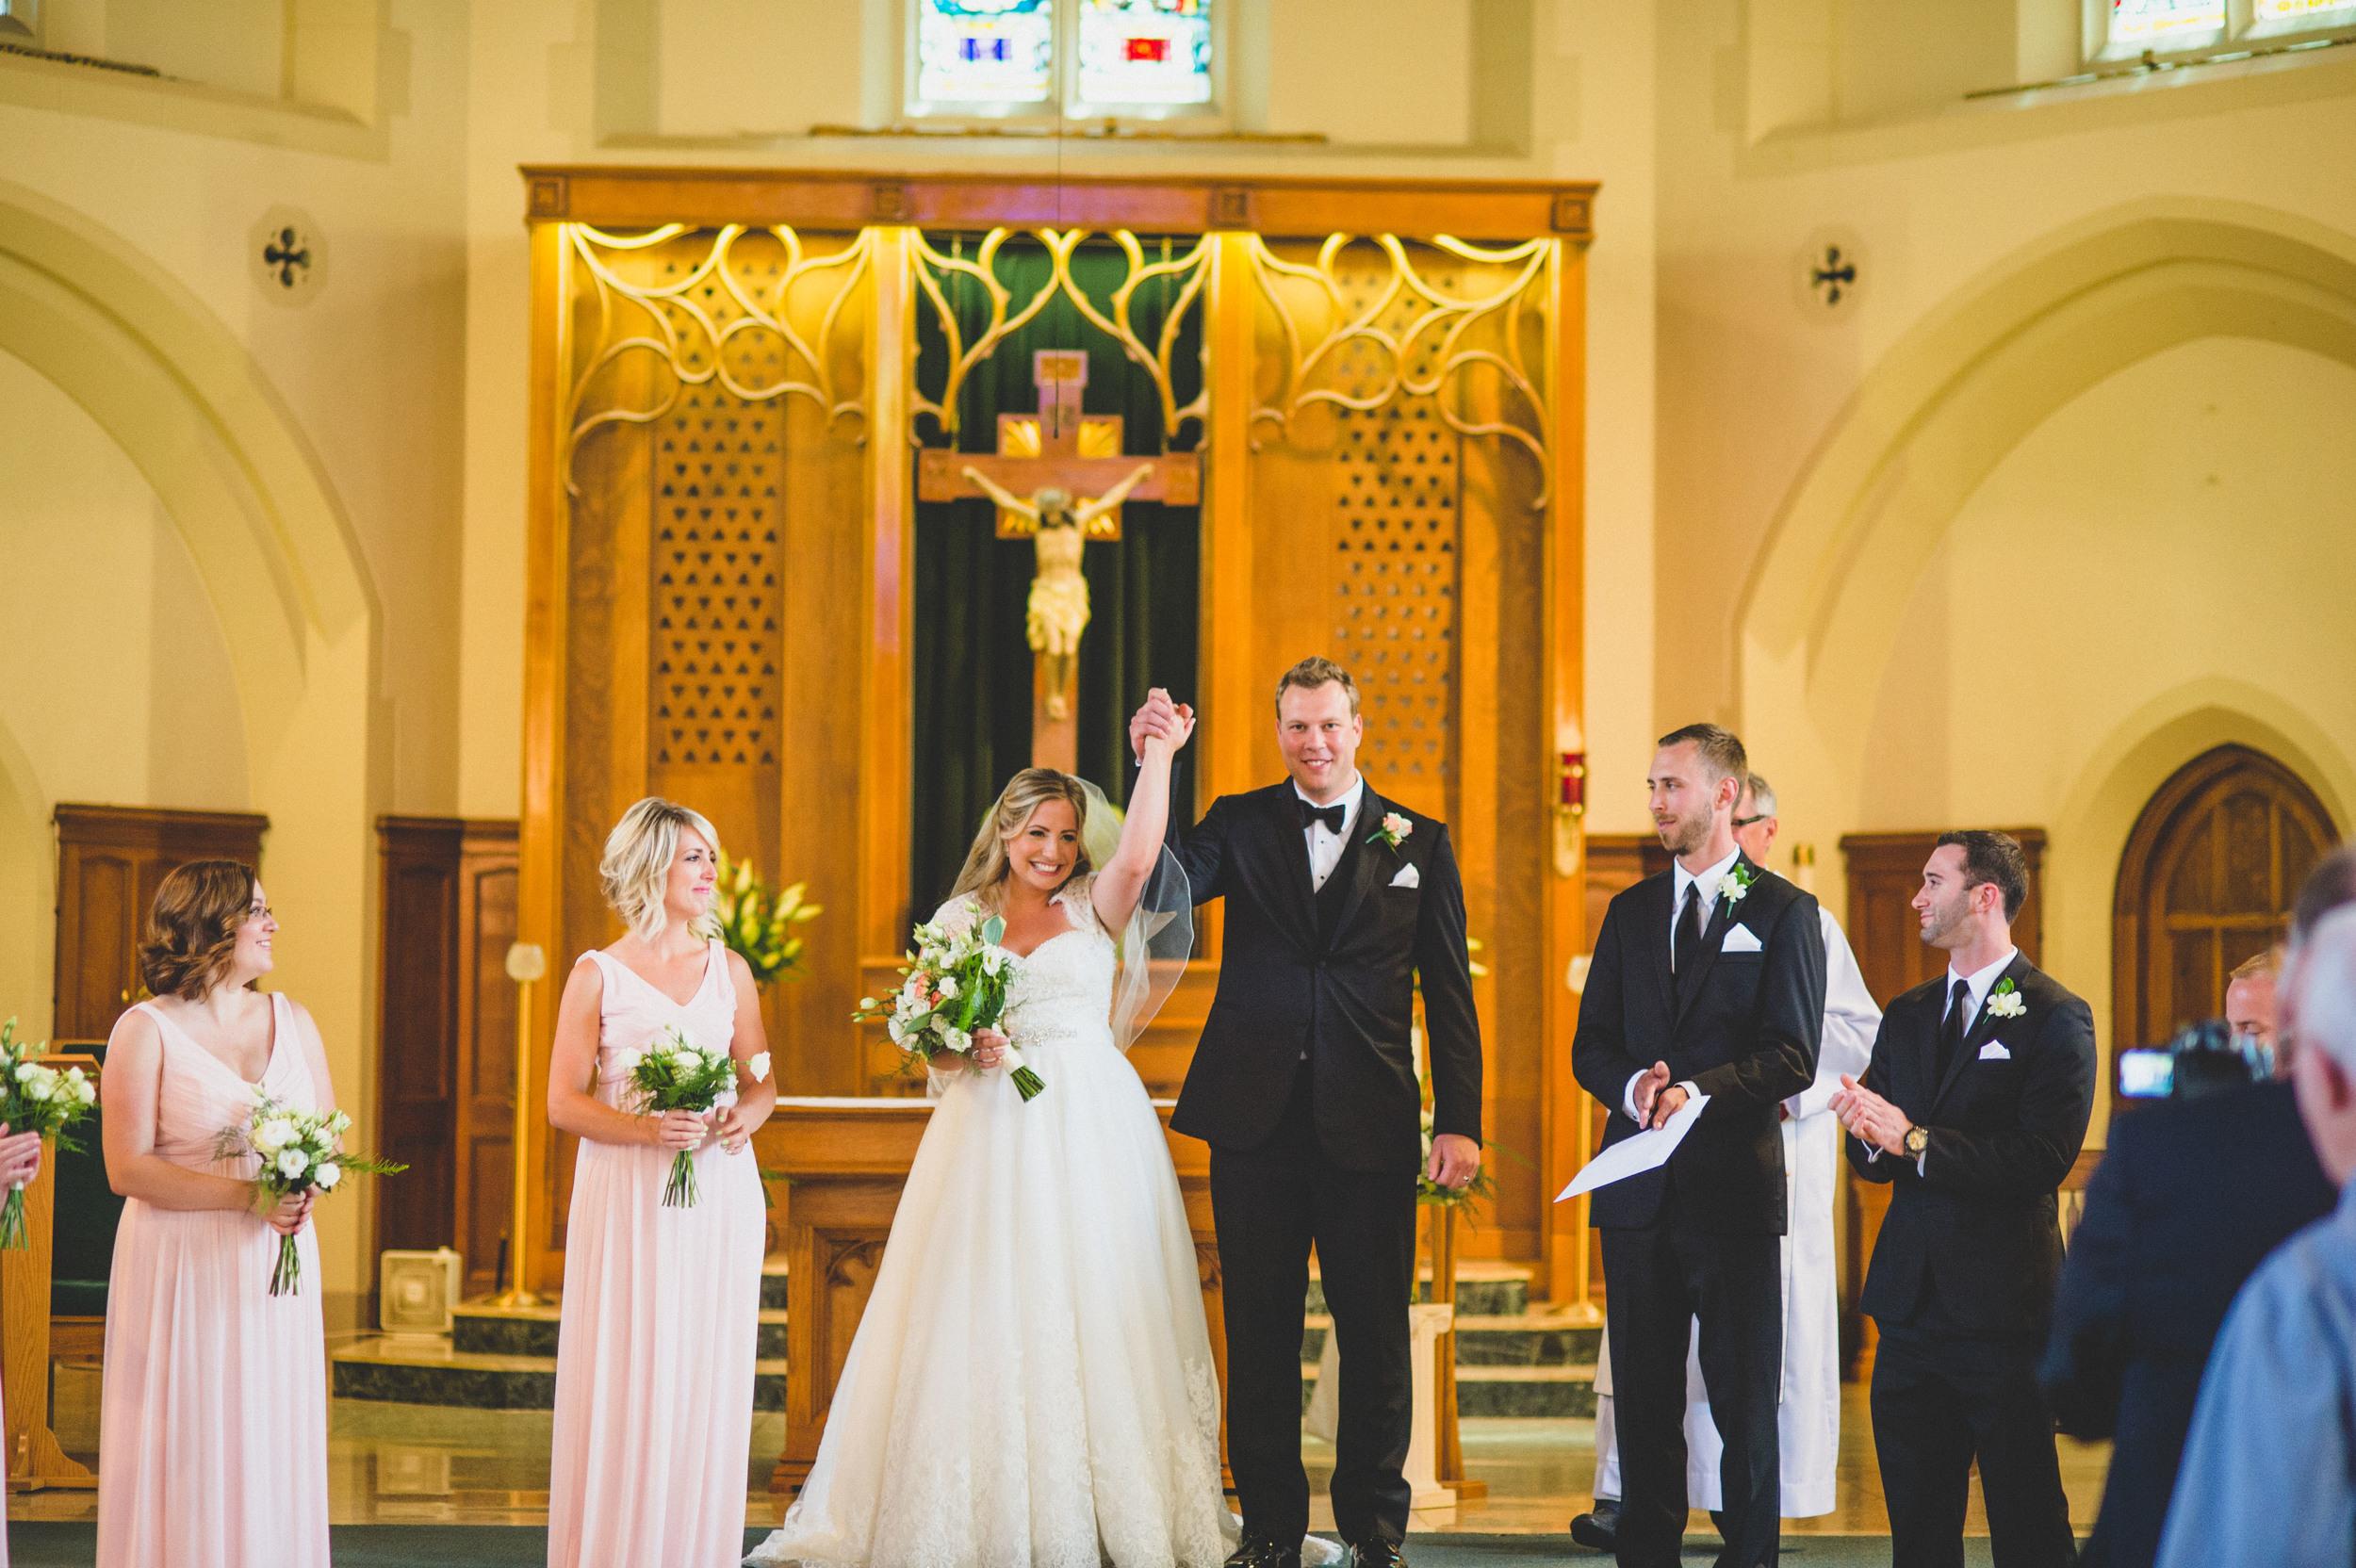 Vancouver St Augustine 's Church wedding photographer edward lai photography-51.jpg